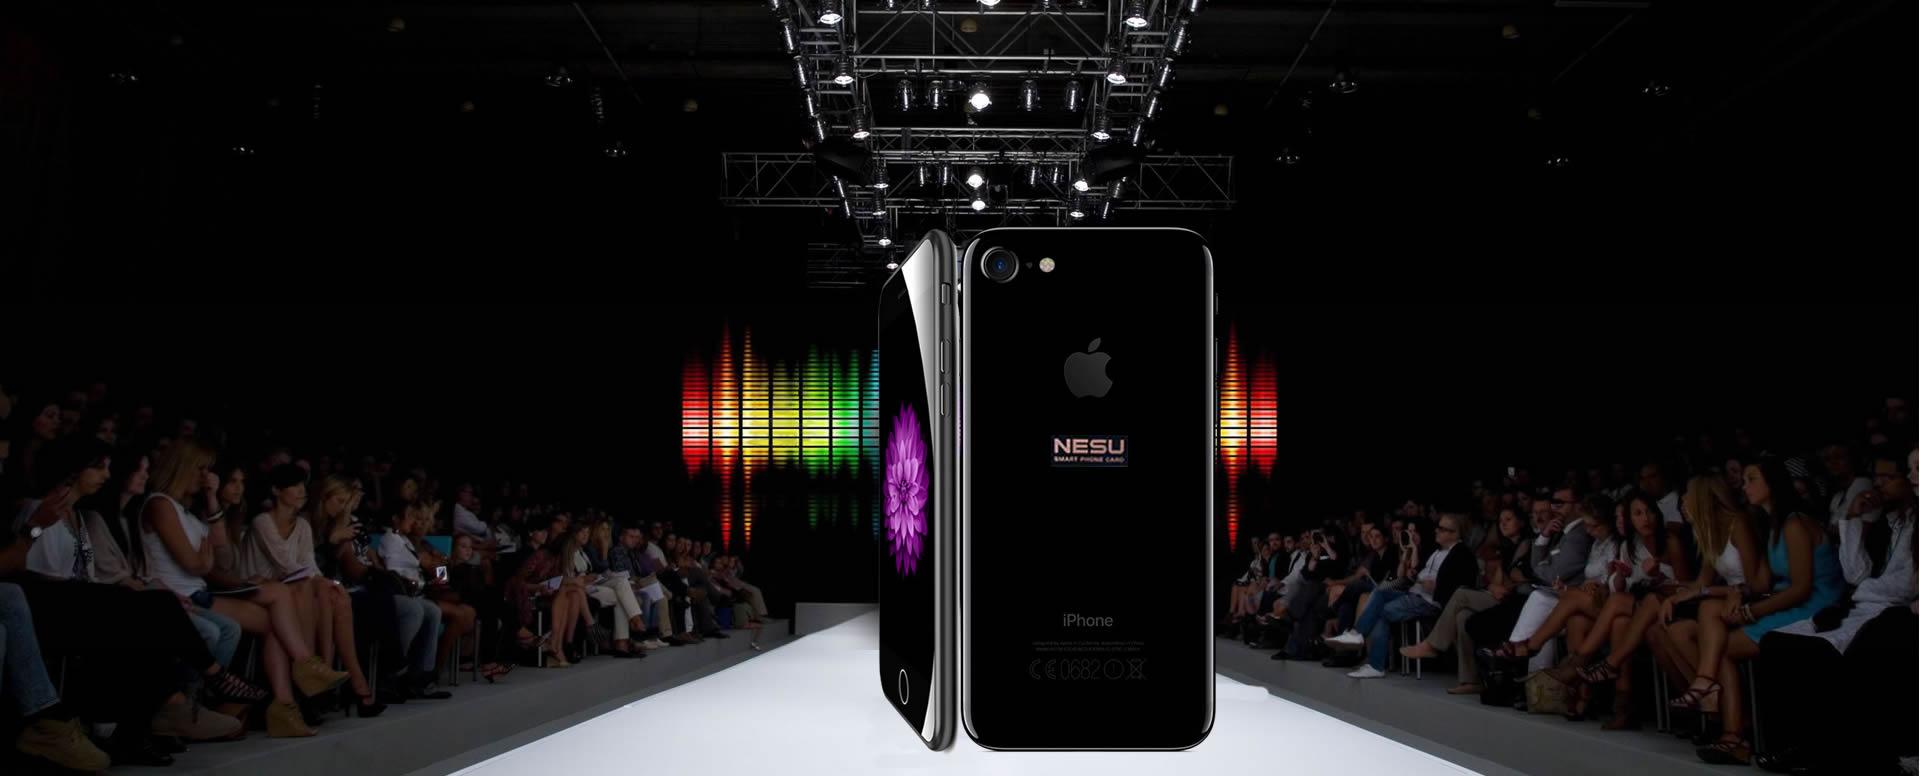 radiacion electromegnetica telefonos moviles modernos